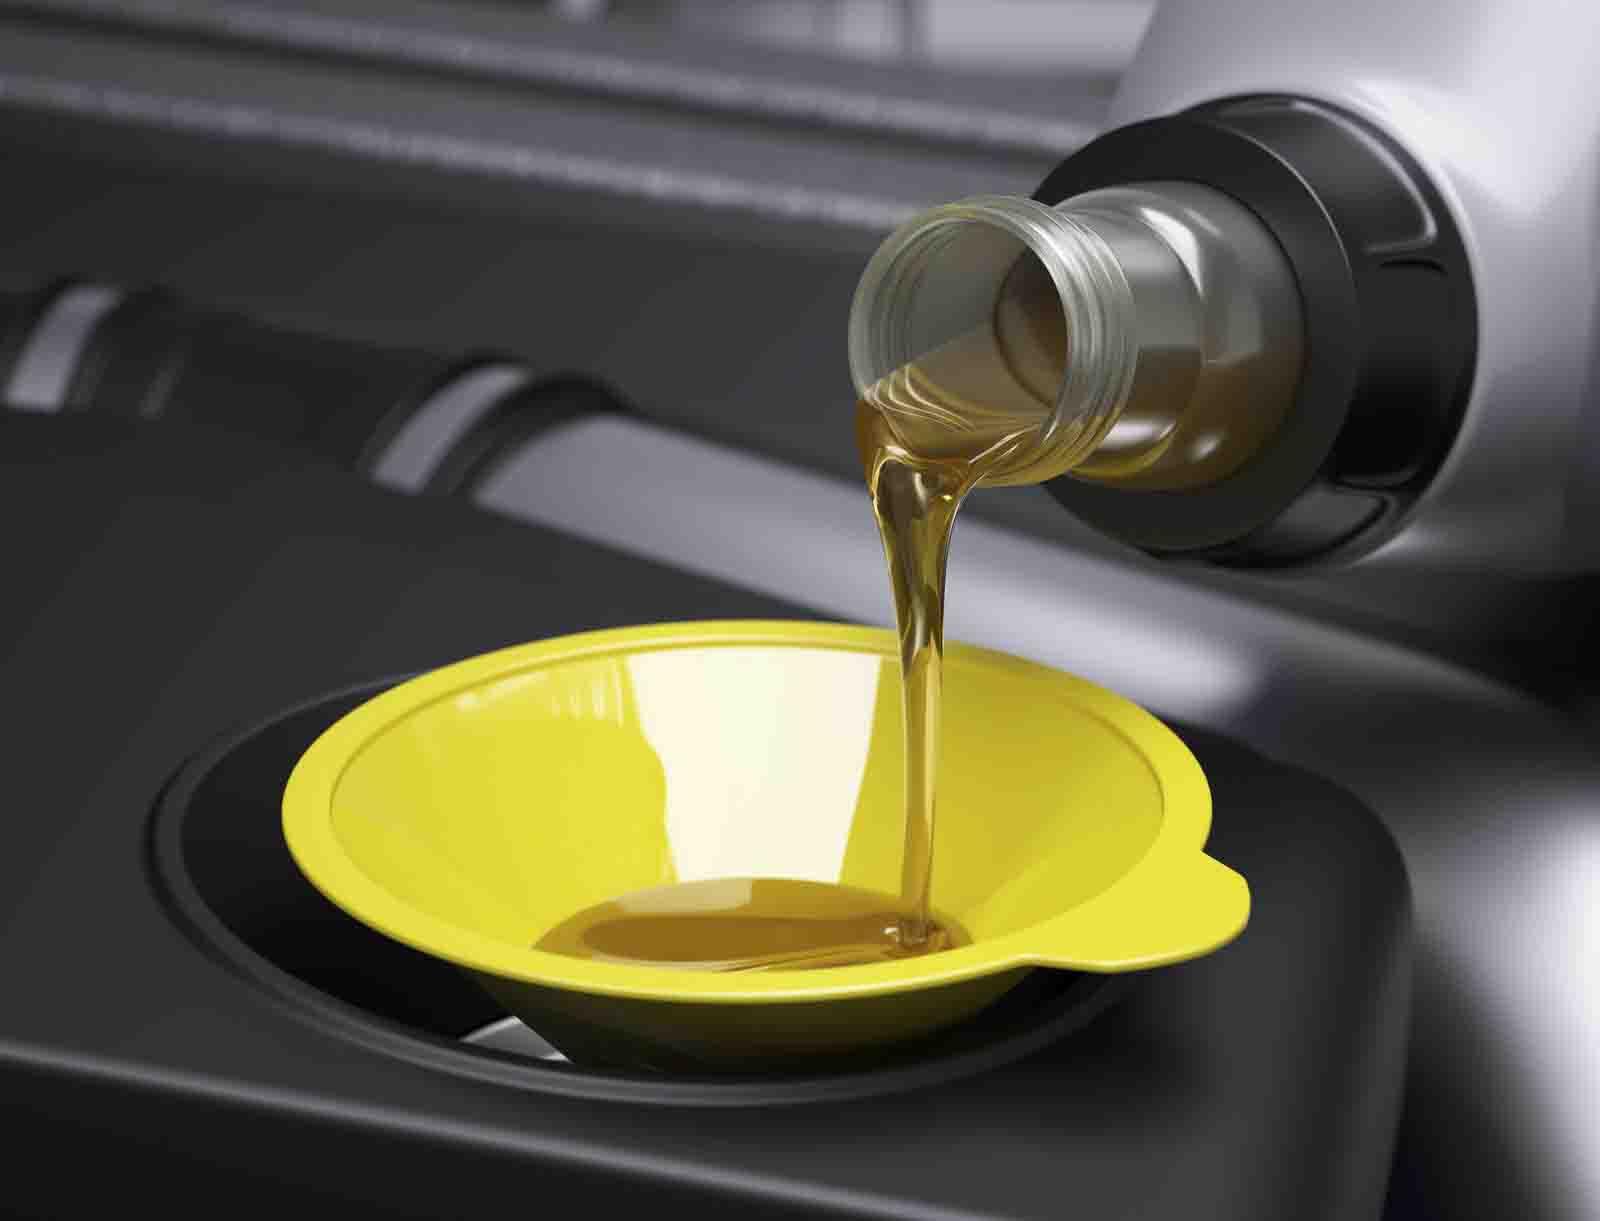 OtoSpek - Obrolan Ringan Seputar Otomotif Tips, Spesifikasi, Info Harga Motor & Mobil